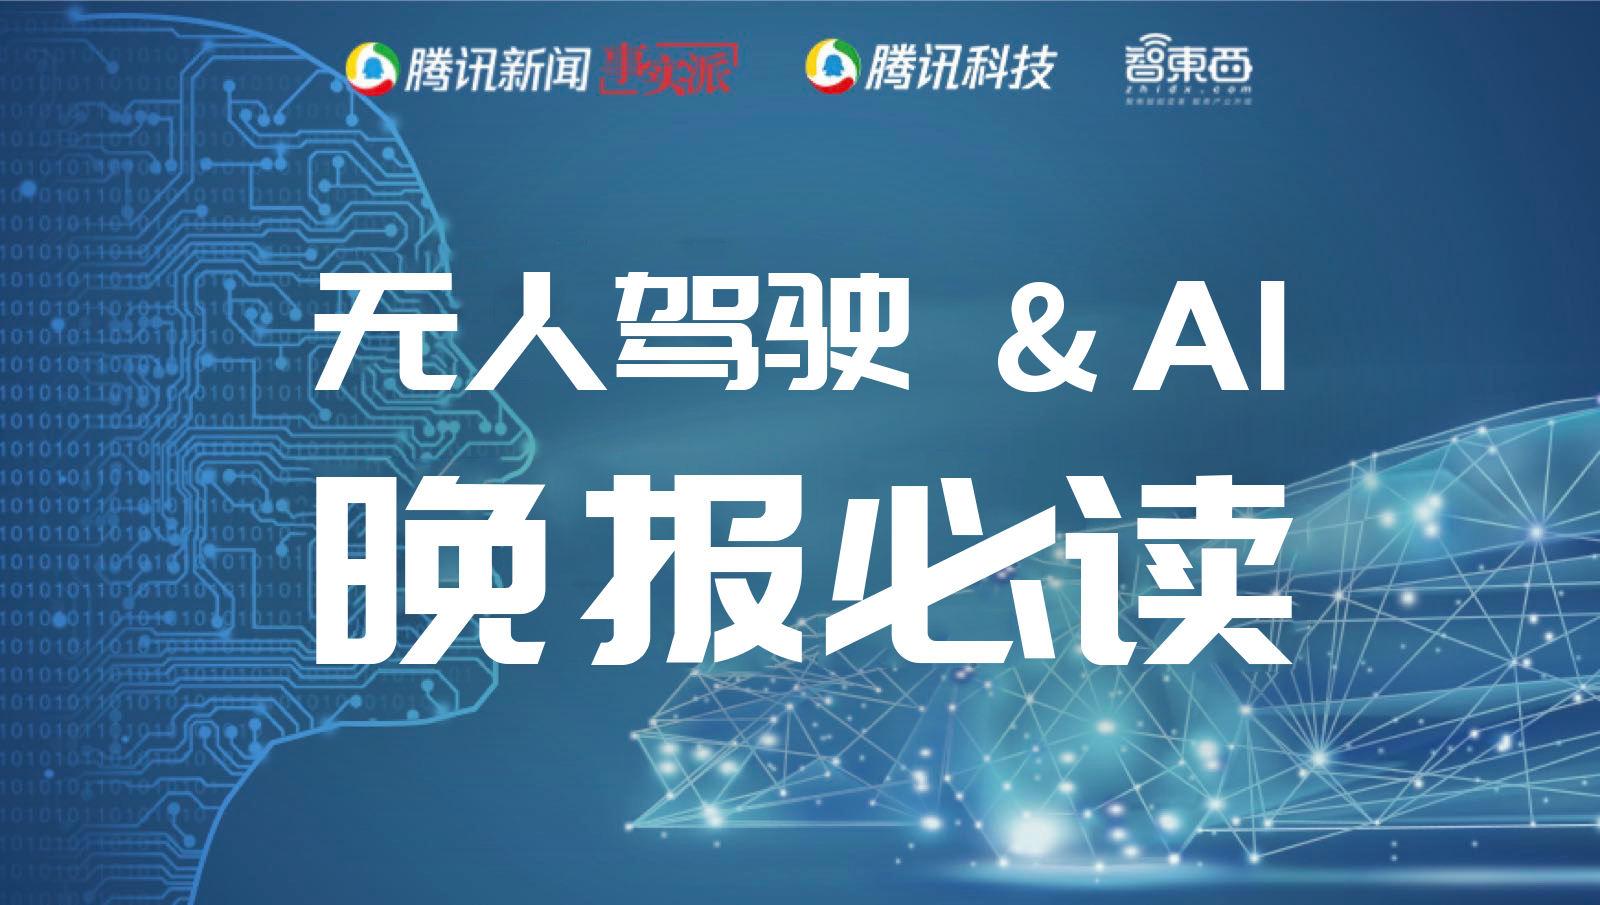 AI晚报:华为郭平:很愿意使用高通芯片造手机 特斯拉最强电池面世